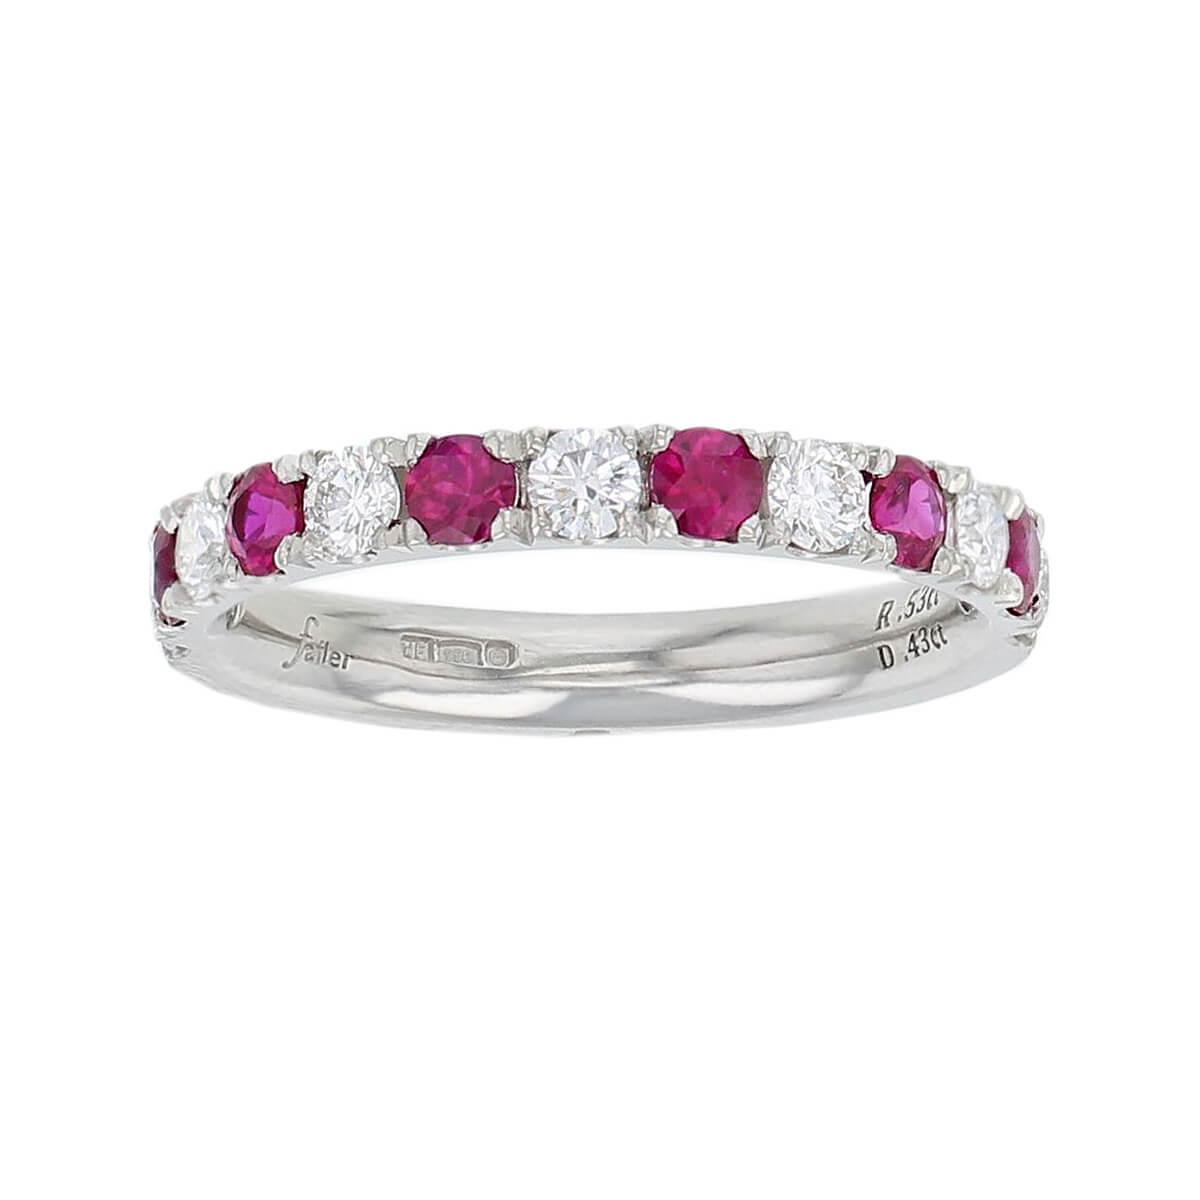 platinum round brilliant cut diamond & ruby eternity ring designer dress ring handmade by Faller, hand crafted, precious jewellery, jewelry, ladies , woman